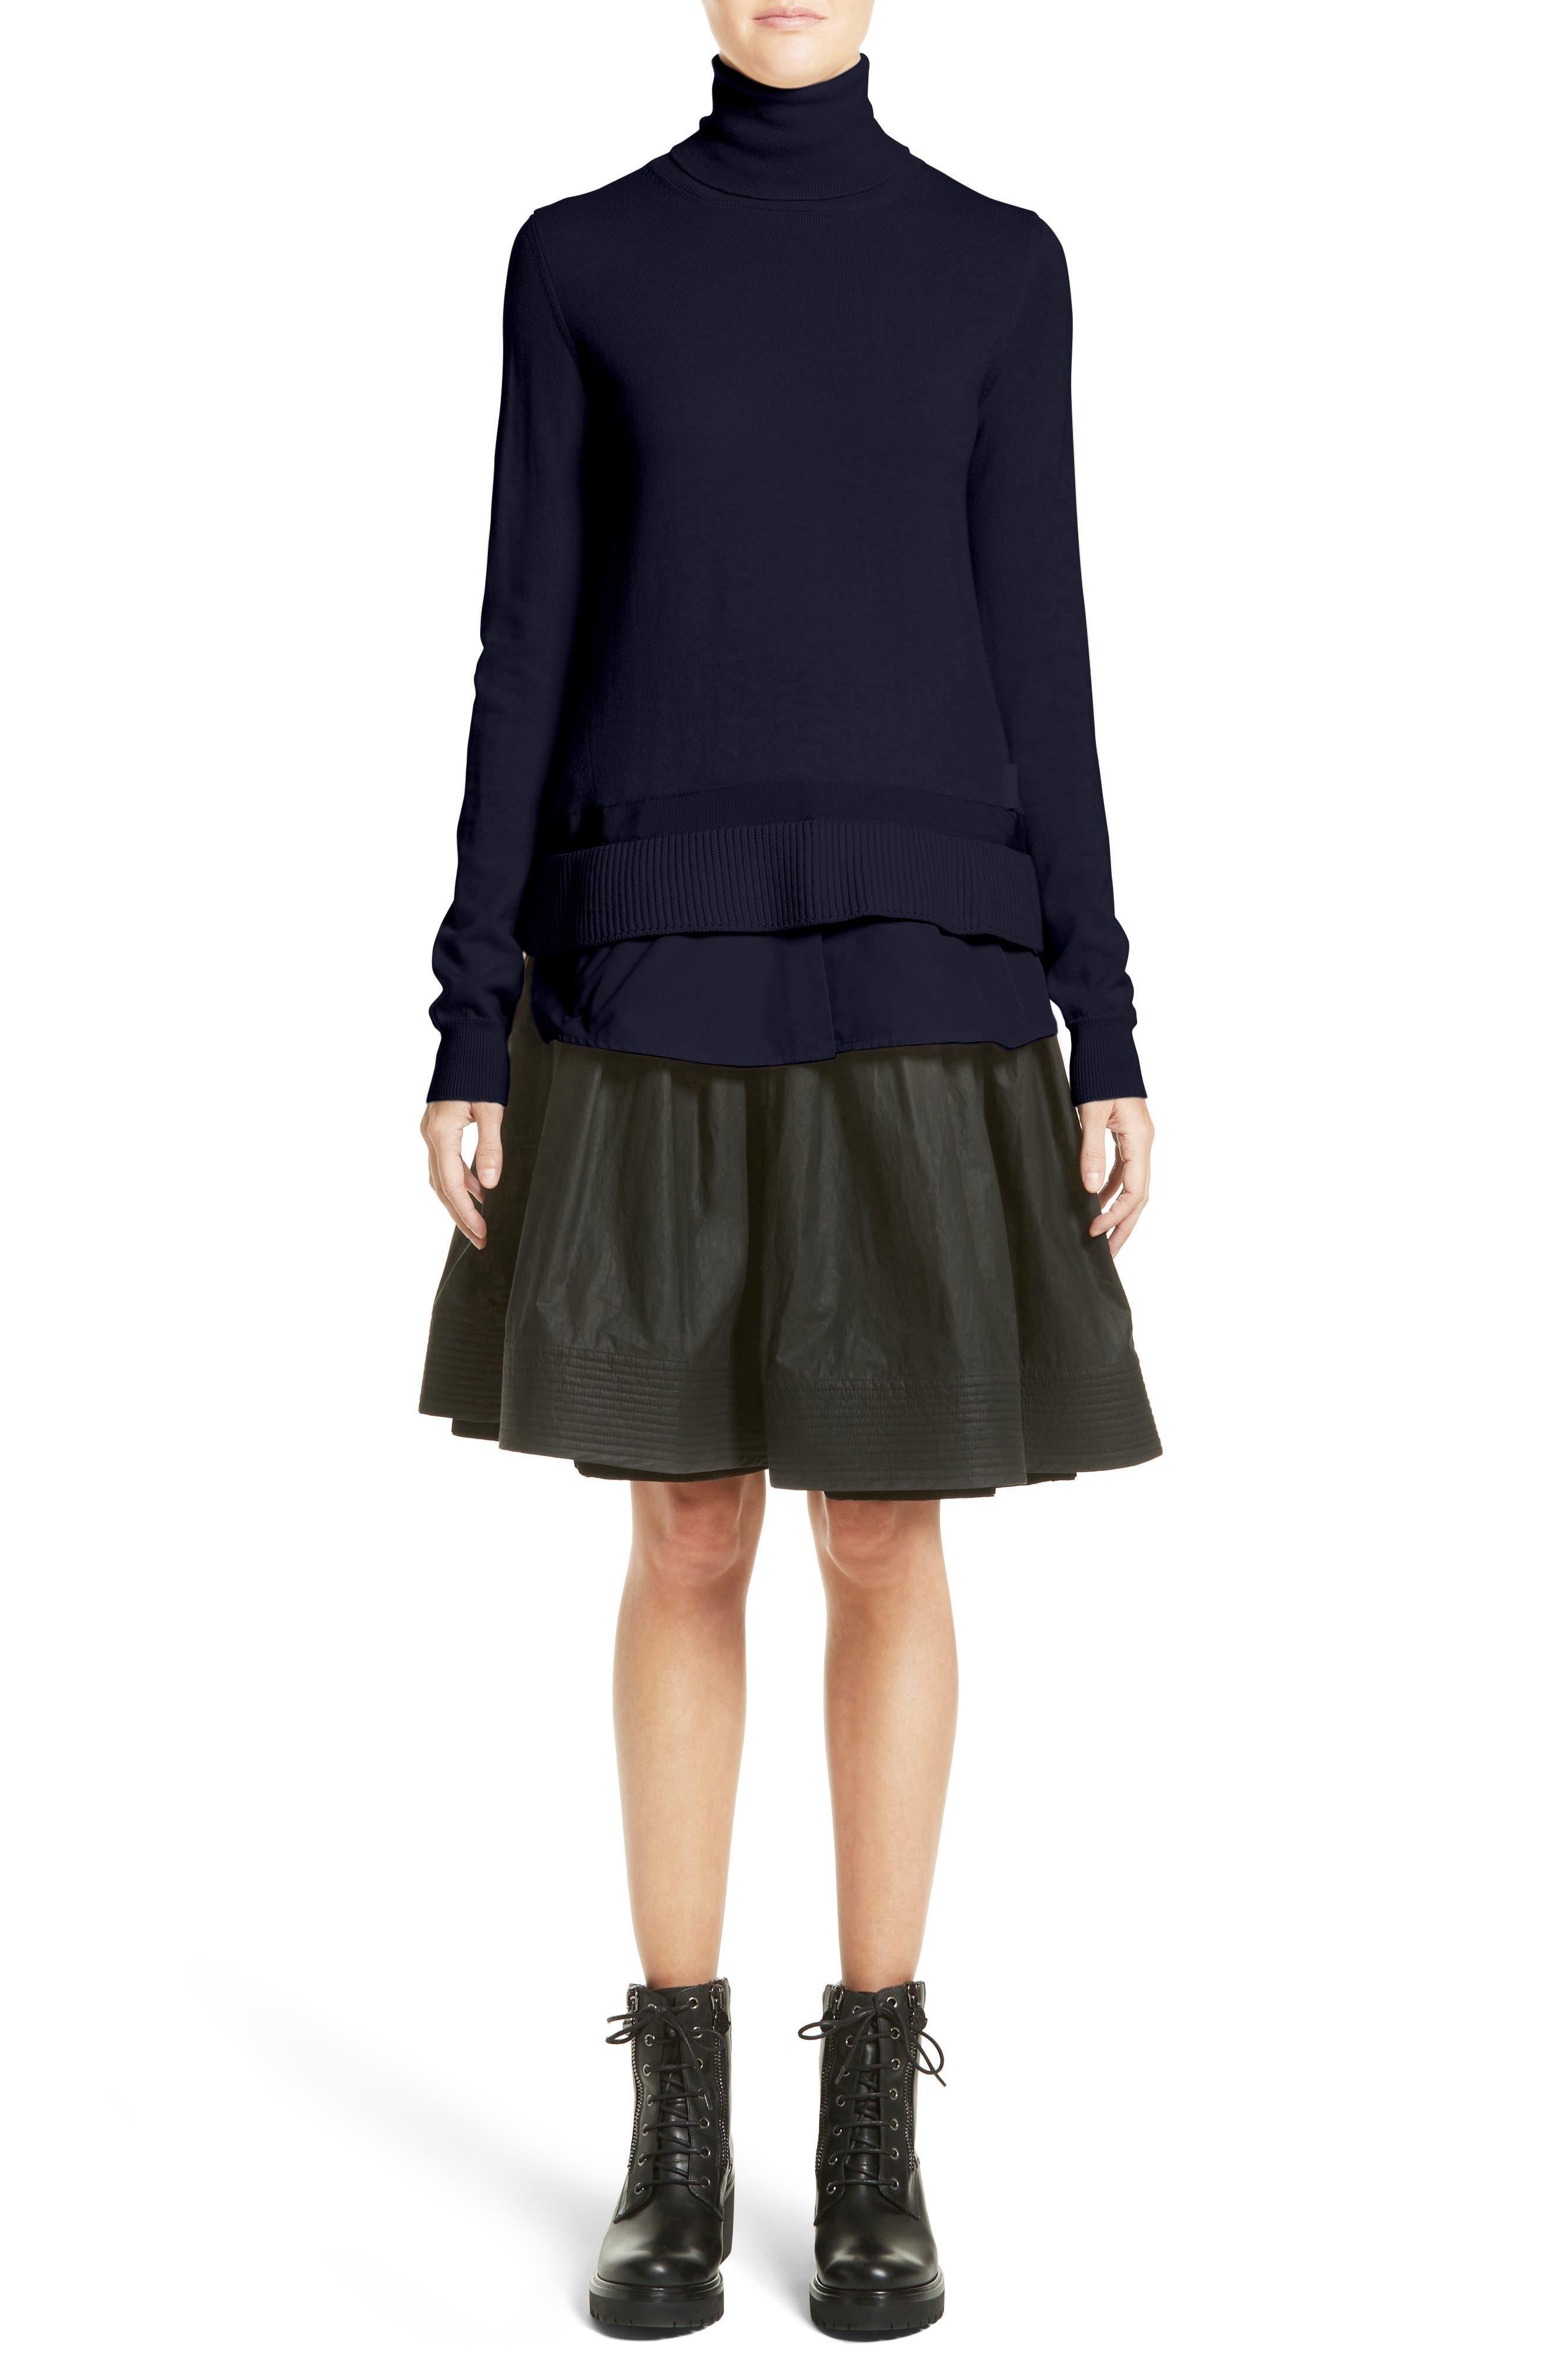 Gonna Cotton A-Line Skirt,                             Alternate thumbnail 6, color,